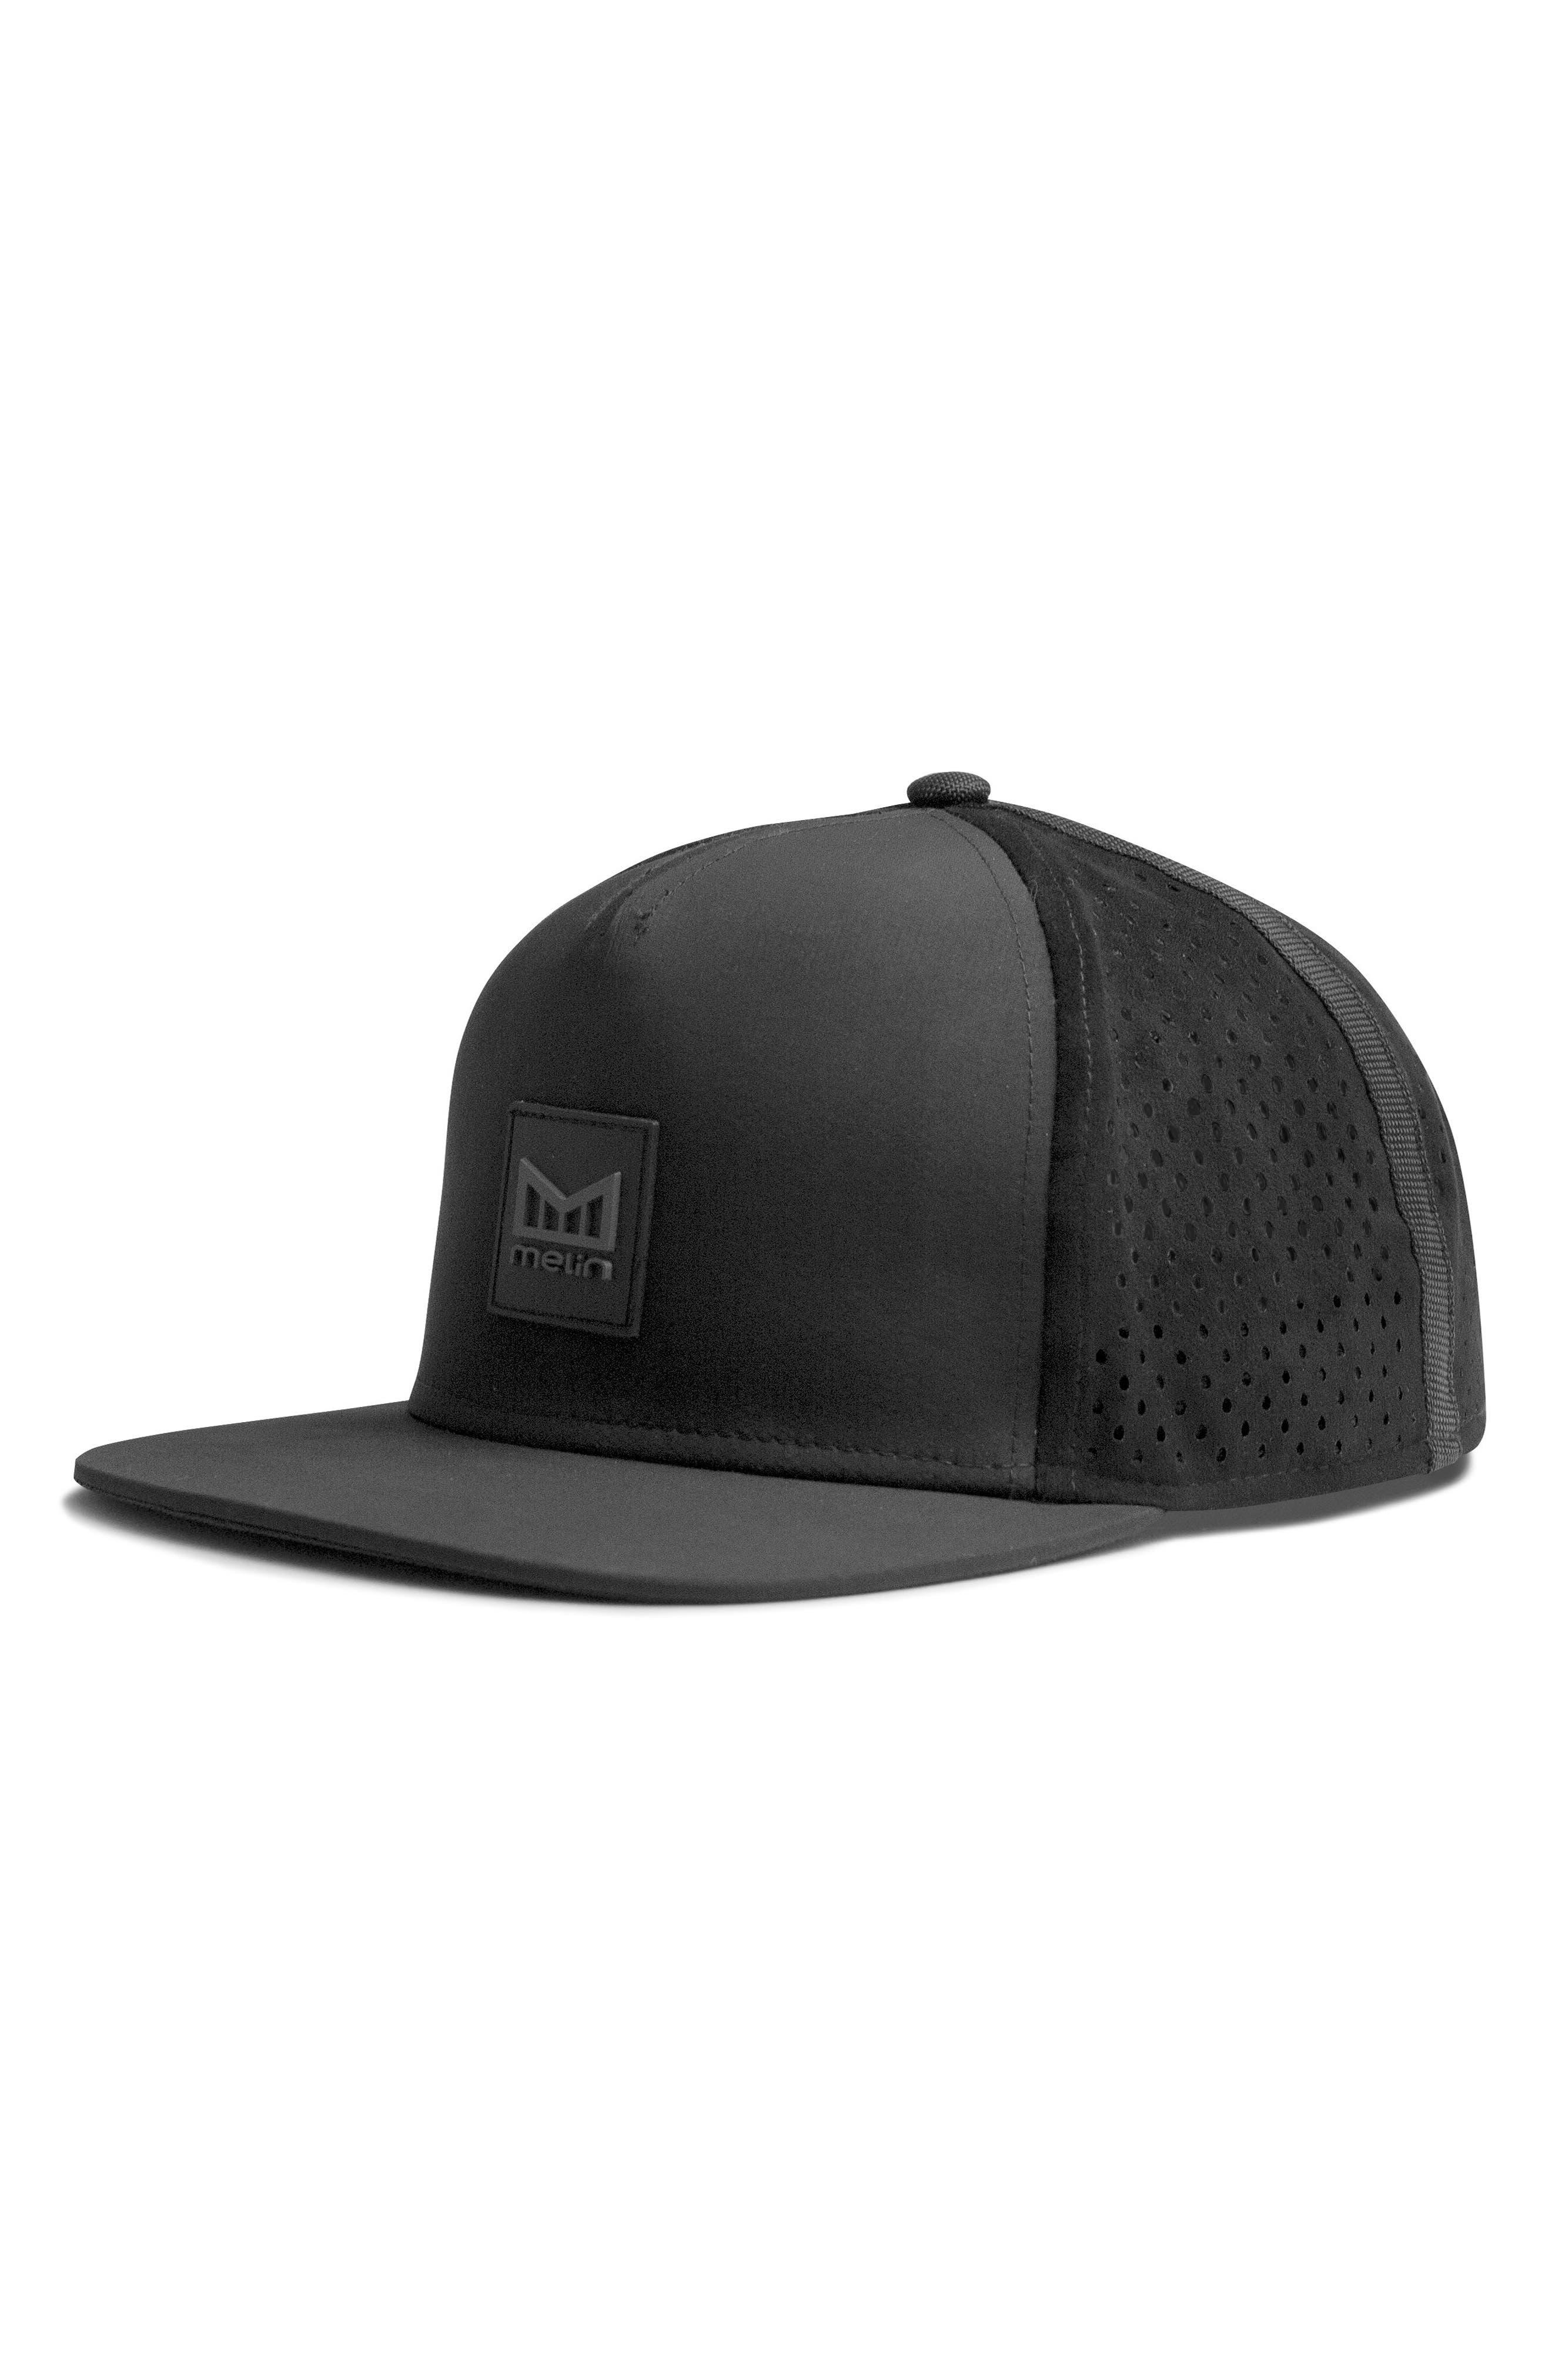 Melin 'The Nomad' Split Fit Snapback Baseball Cap